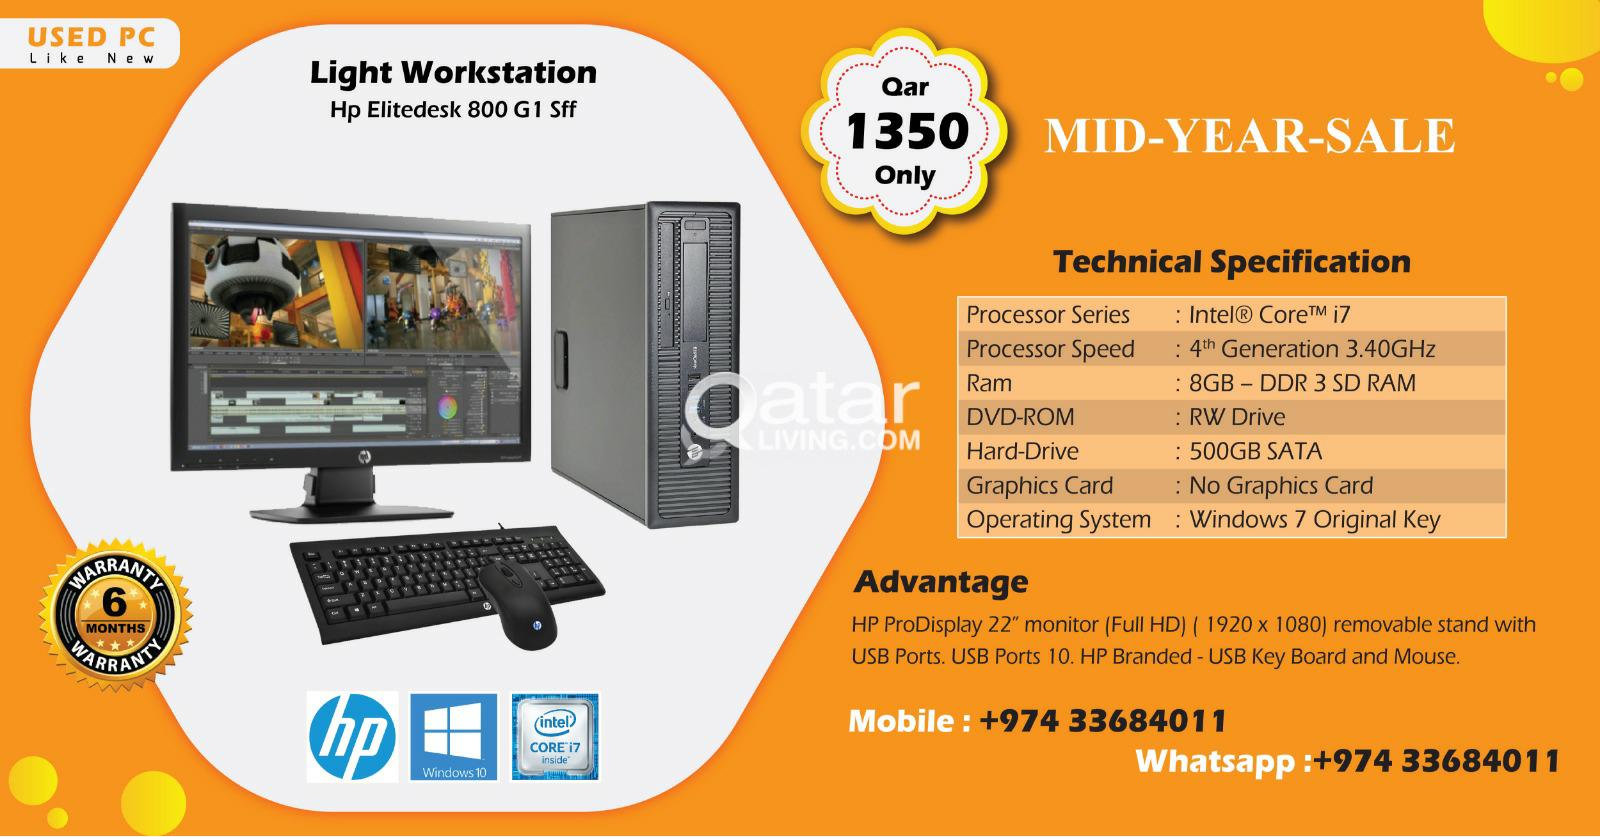 Hp Elitedesk i7-4770 CPU 3 40GH-8GBRAM-500GB HDD | Qatar Living